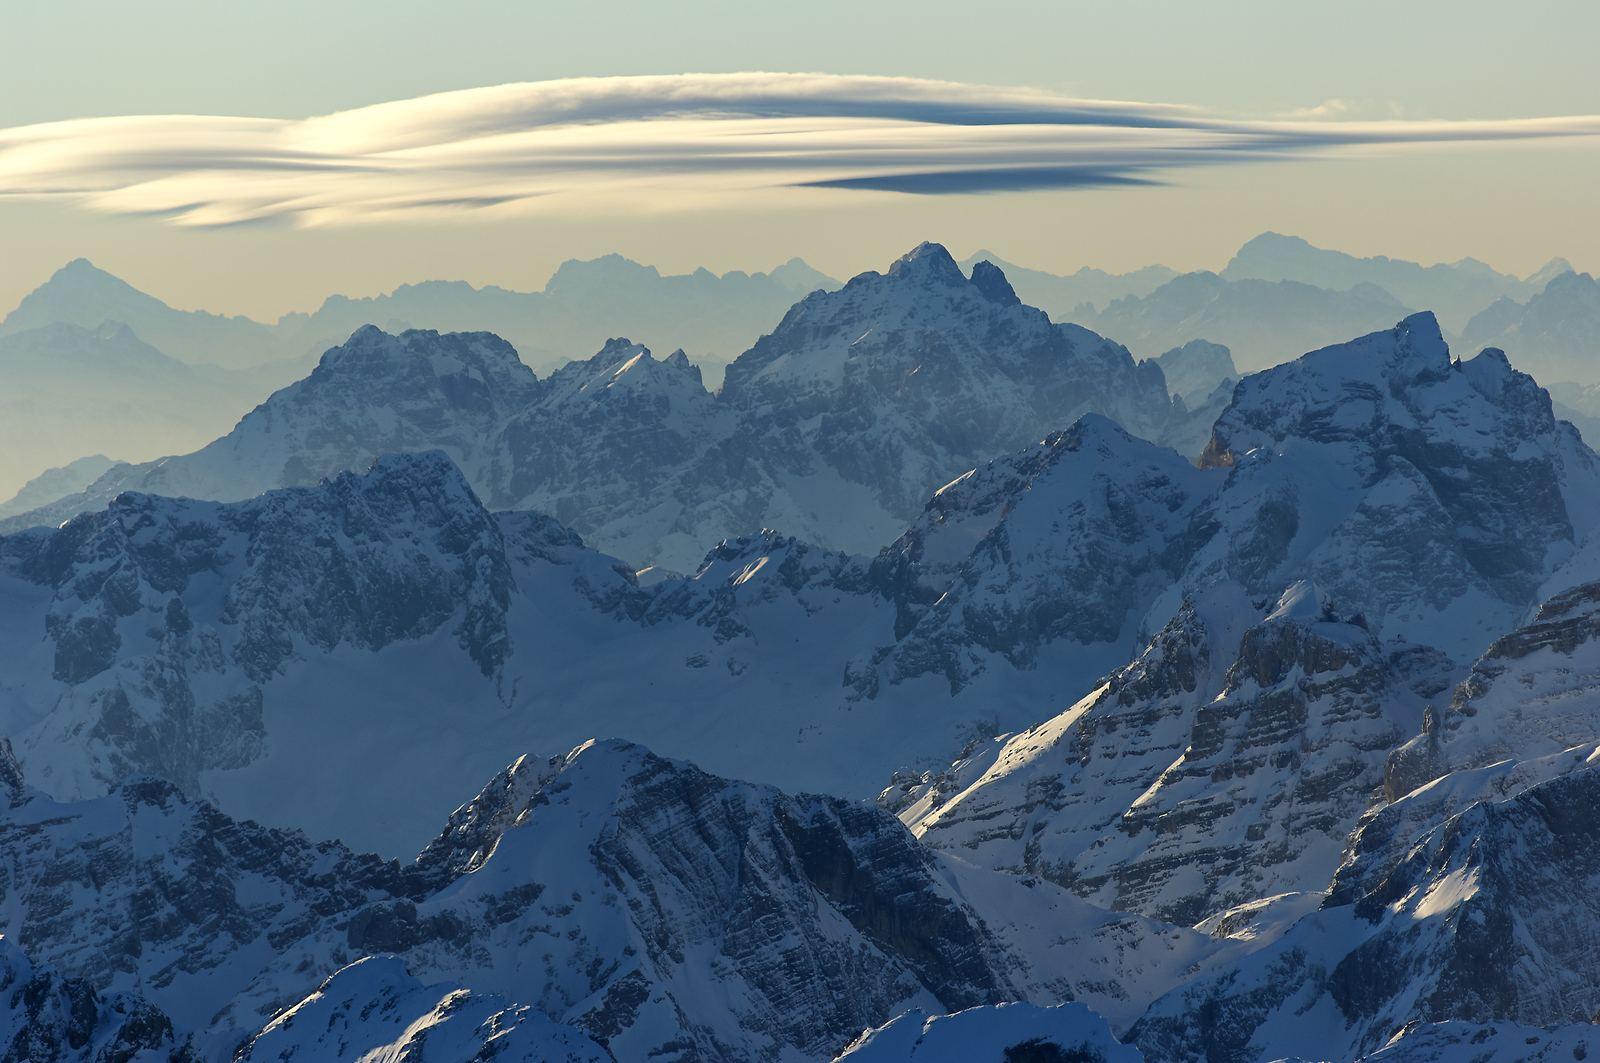 Julské Alpy, Slovinsko. Foto: Matevž Lenarčič